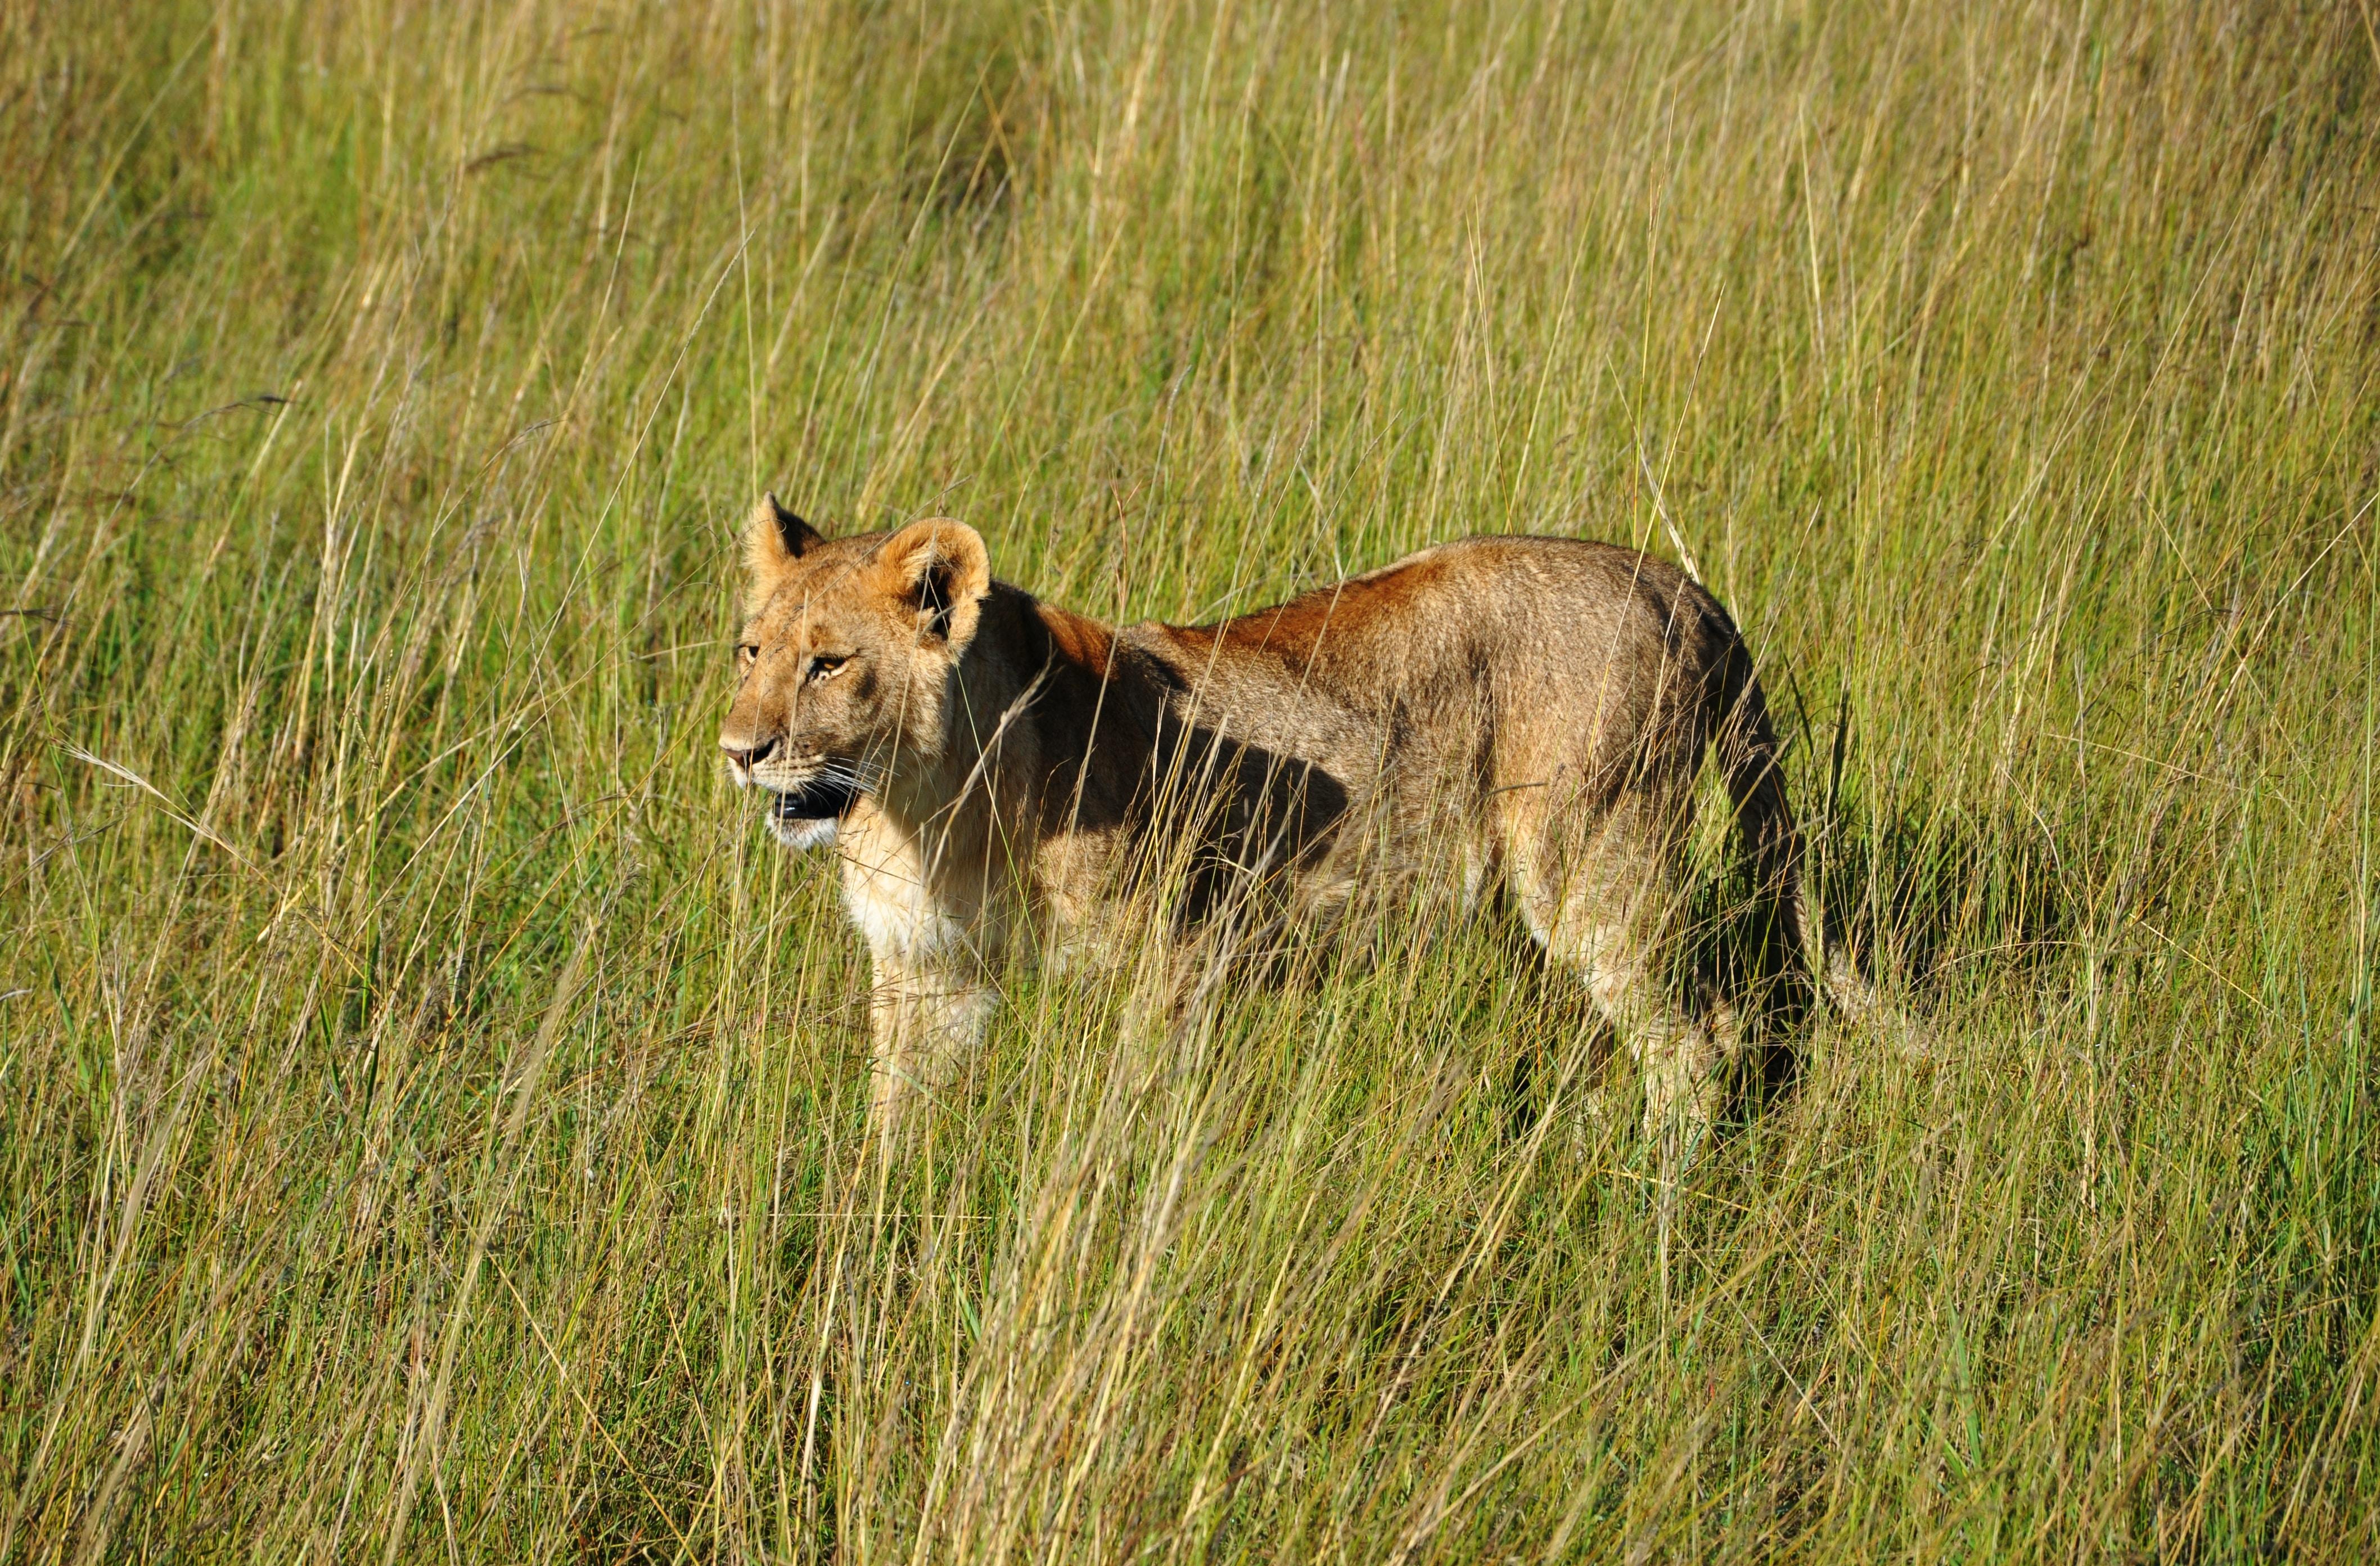 lioness on grass field